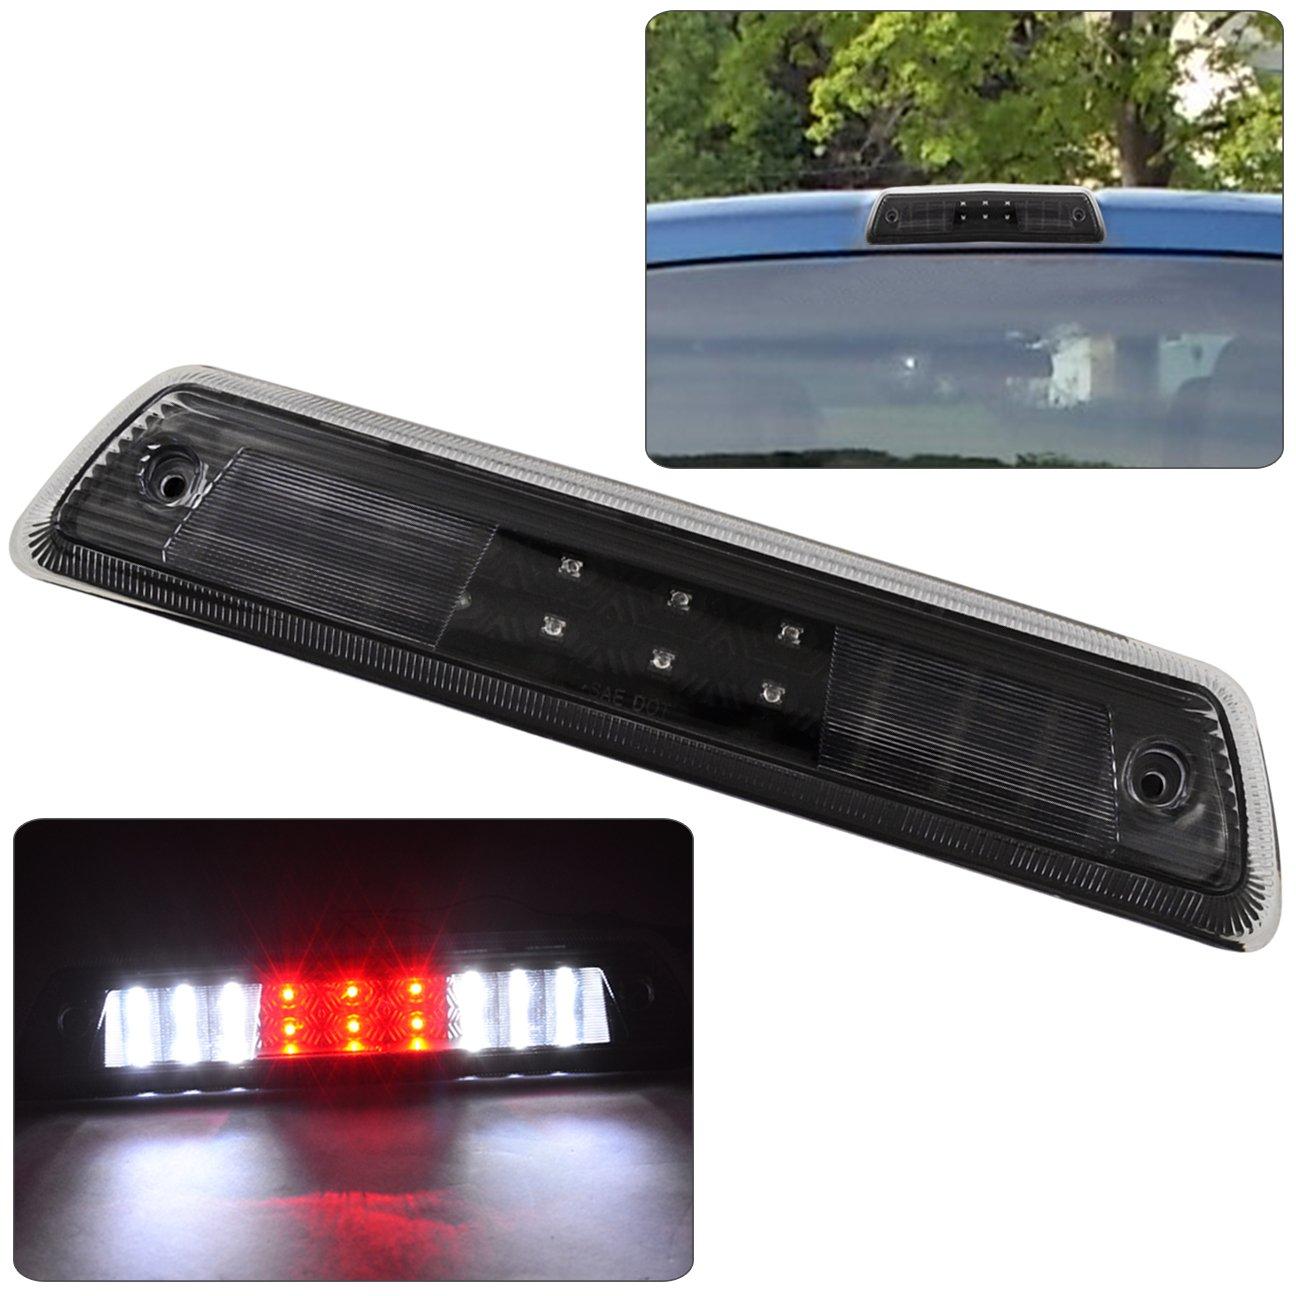 09 10 11 12 13 14  Ford F-150 F150 Smoke Lens LED BAR Third Brake Light SMOKED